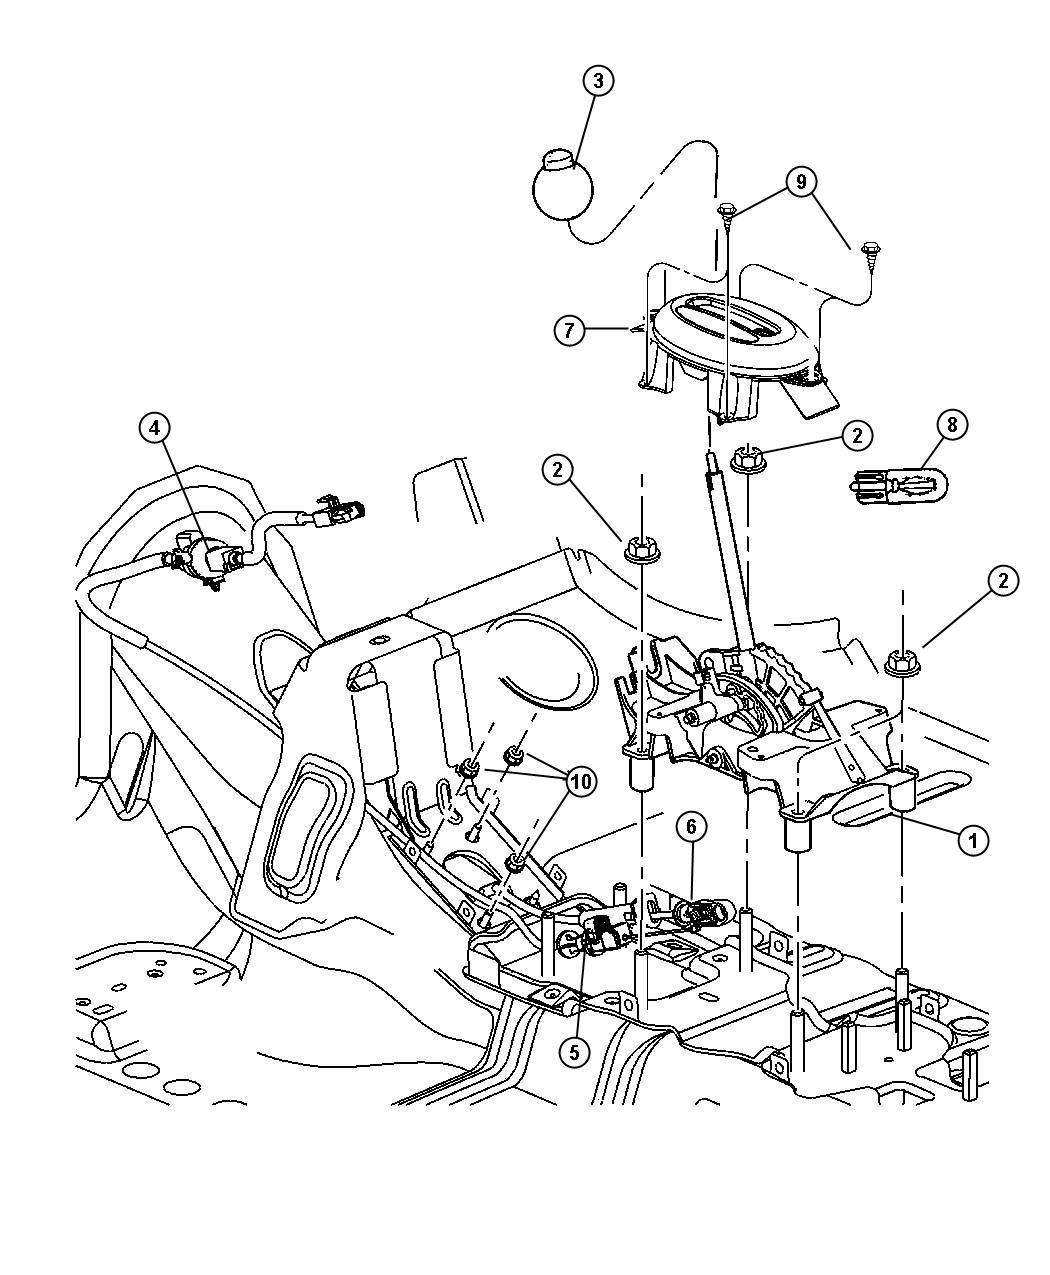 2002 Chrysler Pt Cruiser Cable. Ignition interlock